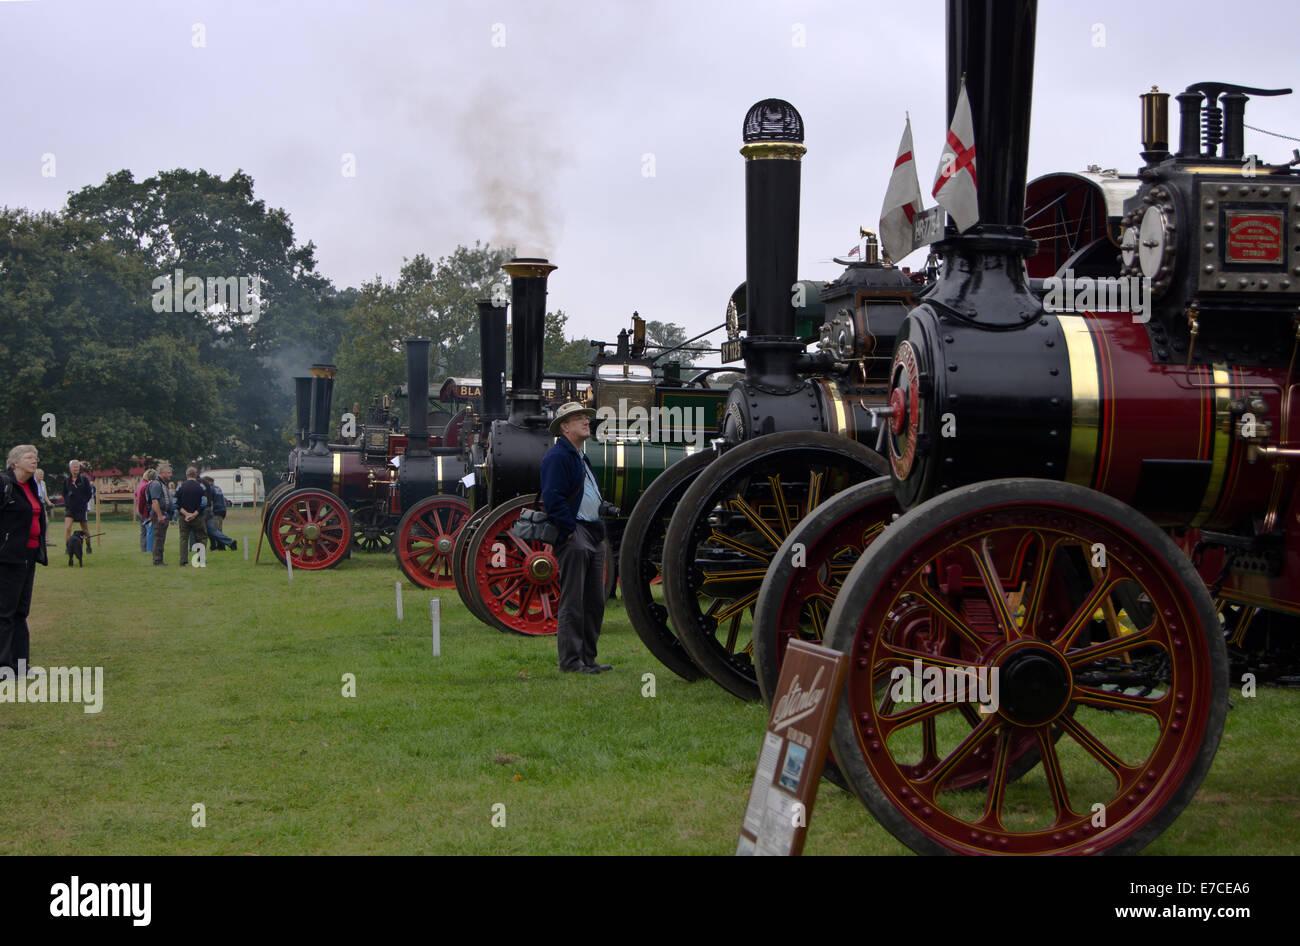 Steam Engine Display Stock Photos & Steam Engine Display